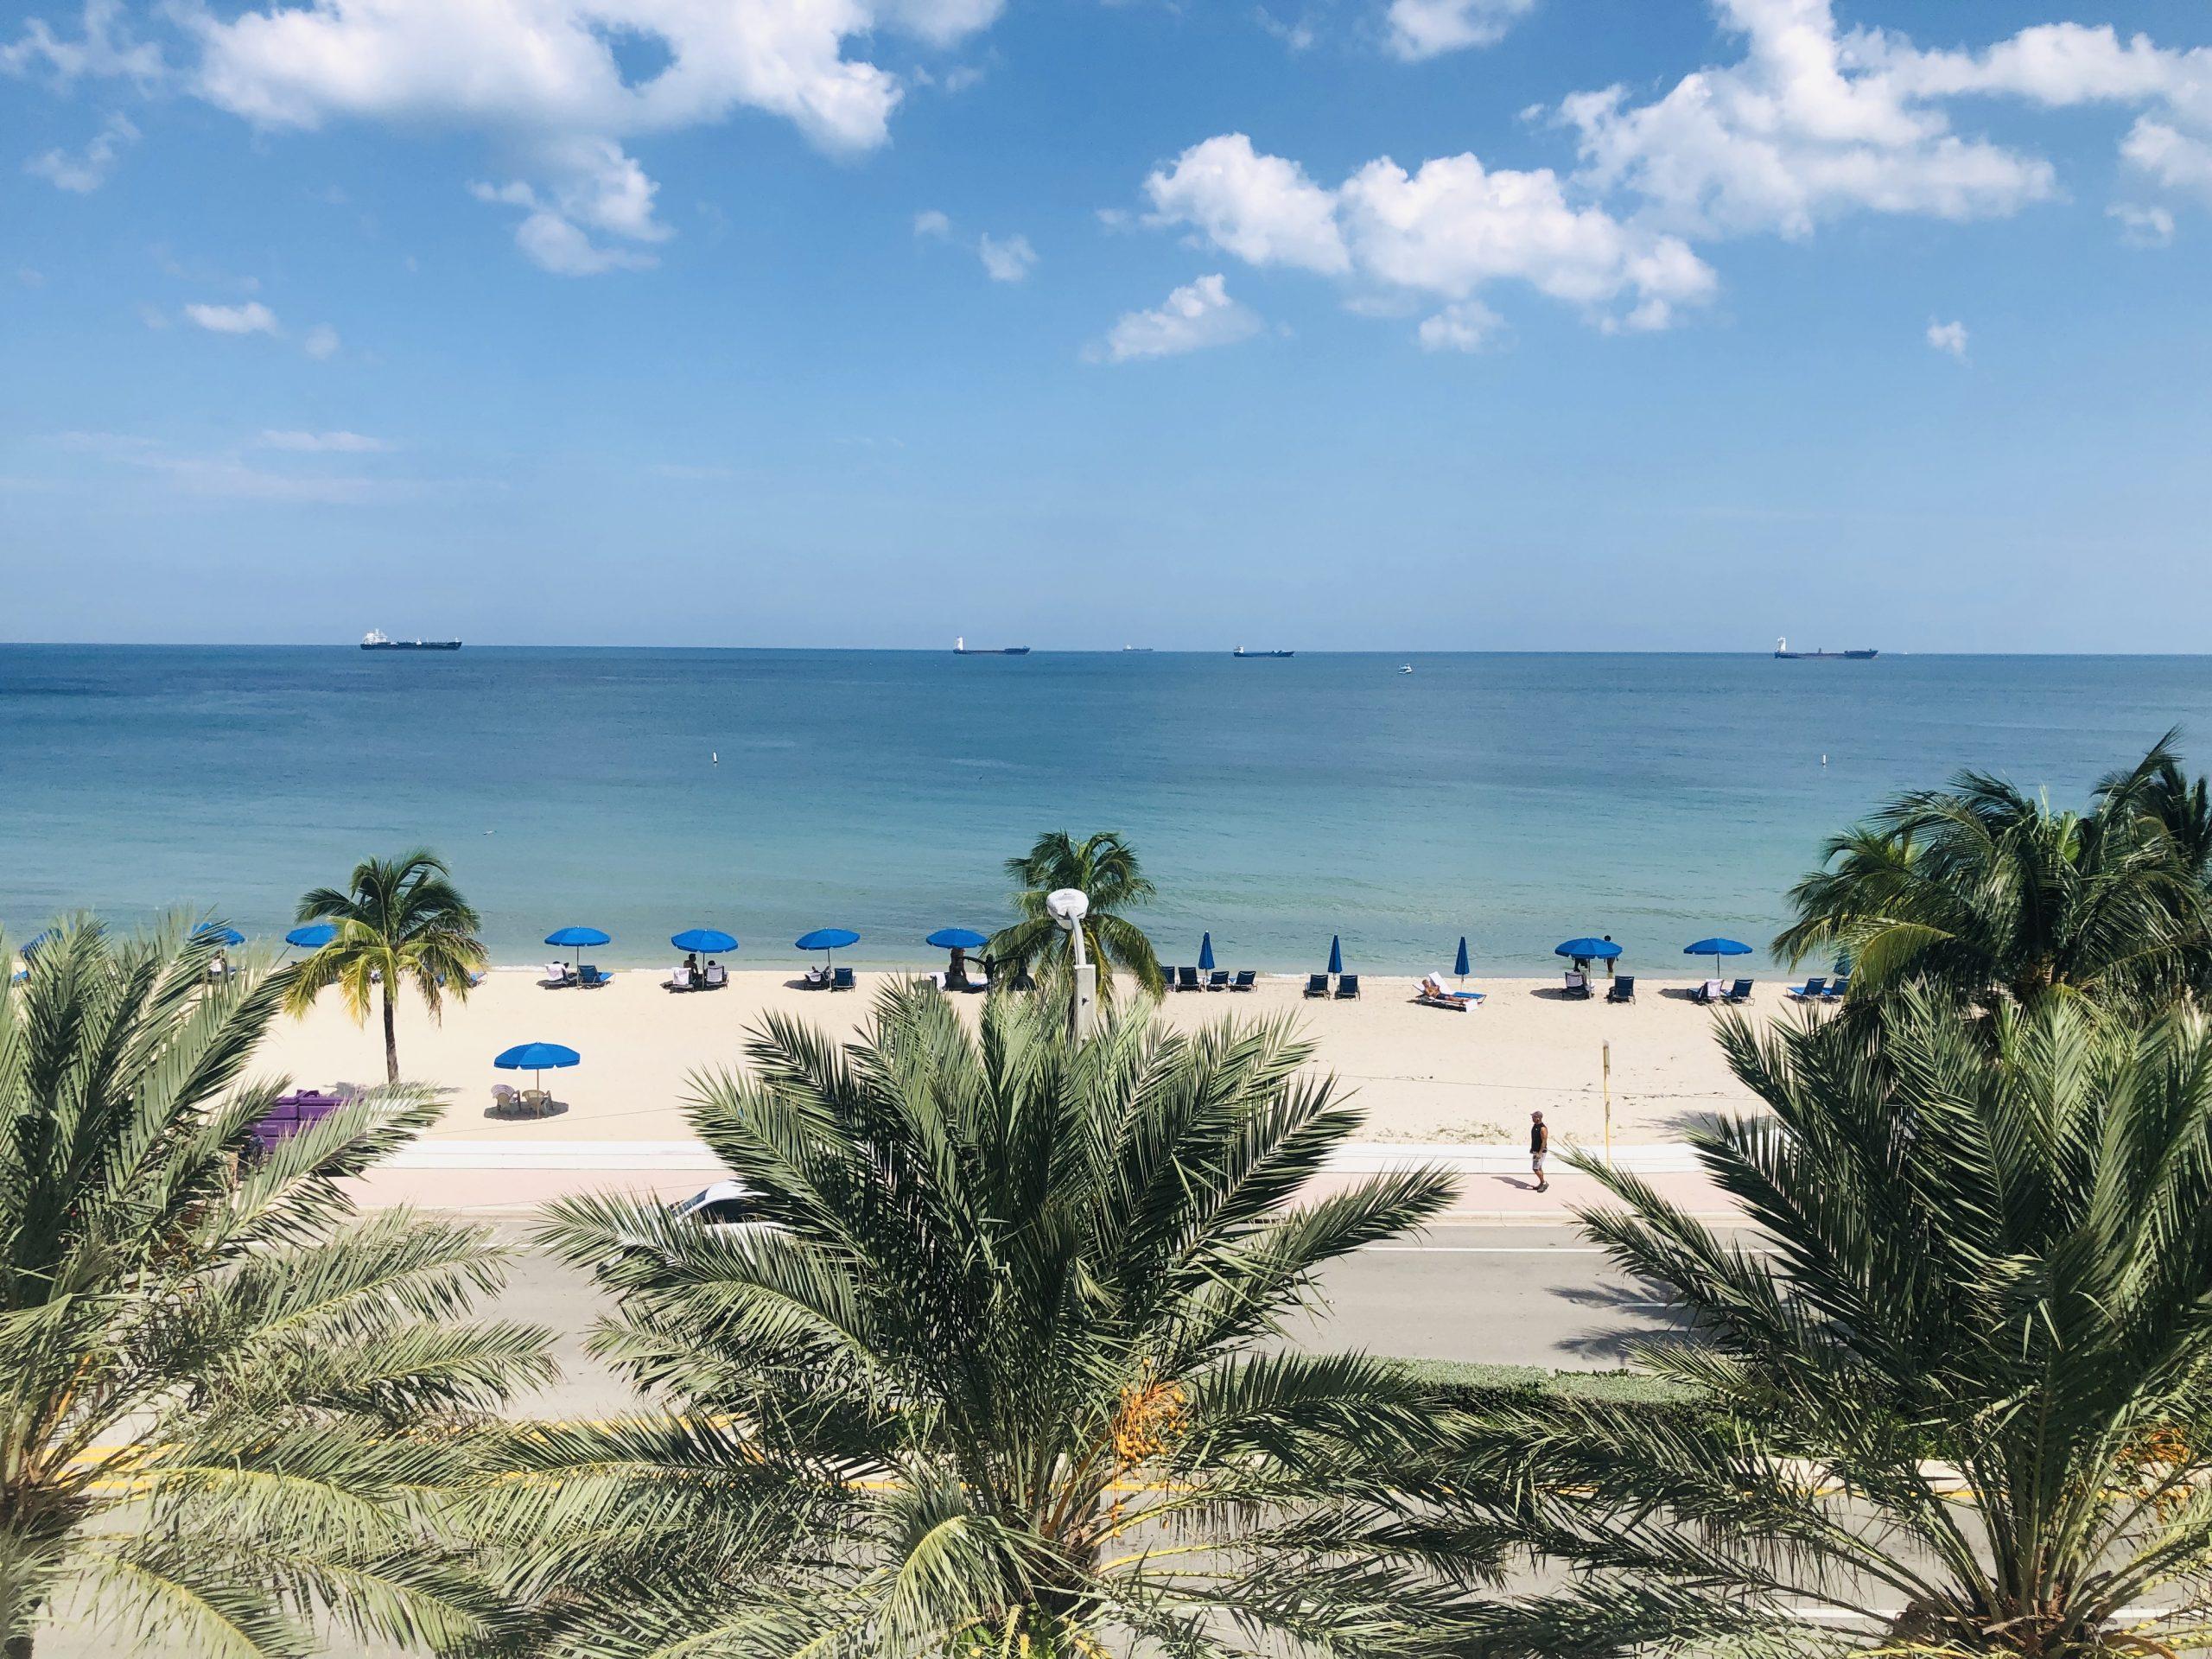 A Brief Travel Guide For Miami, Florida